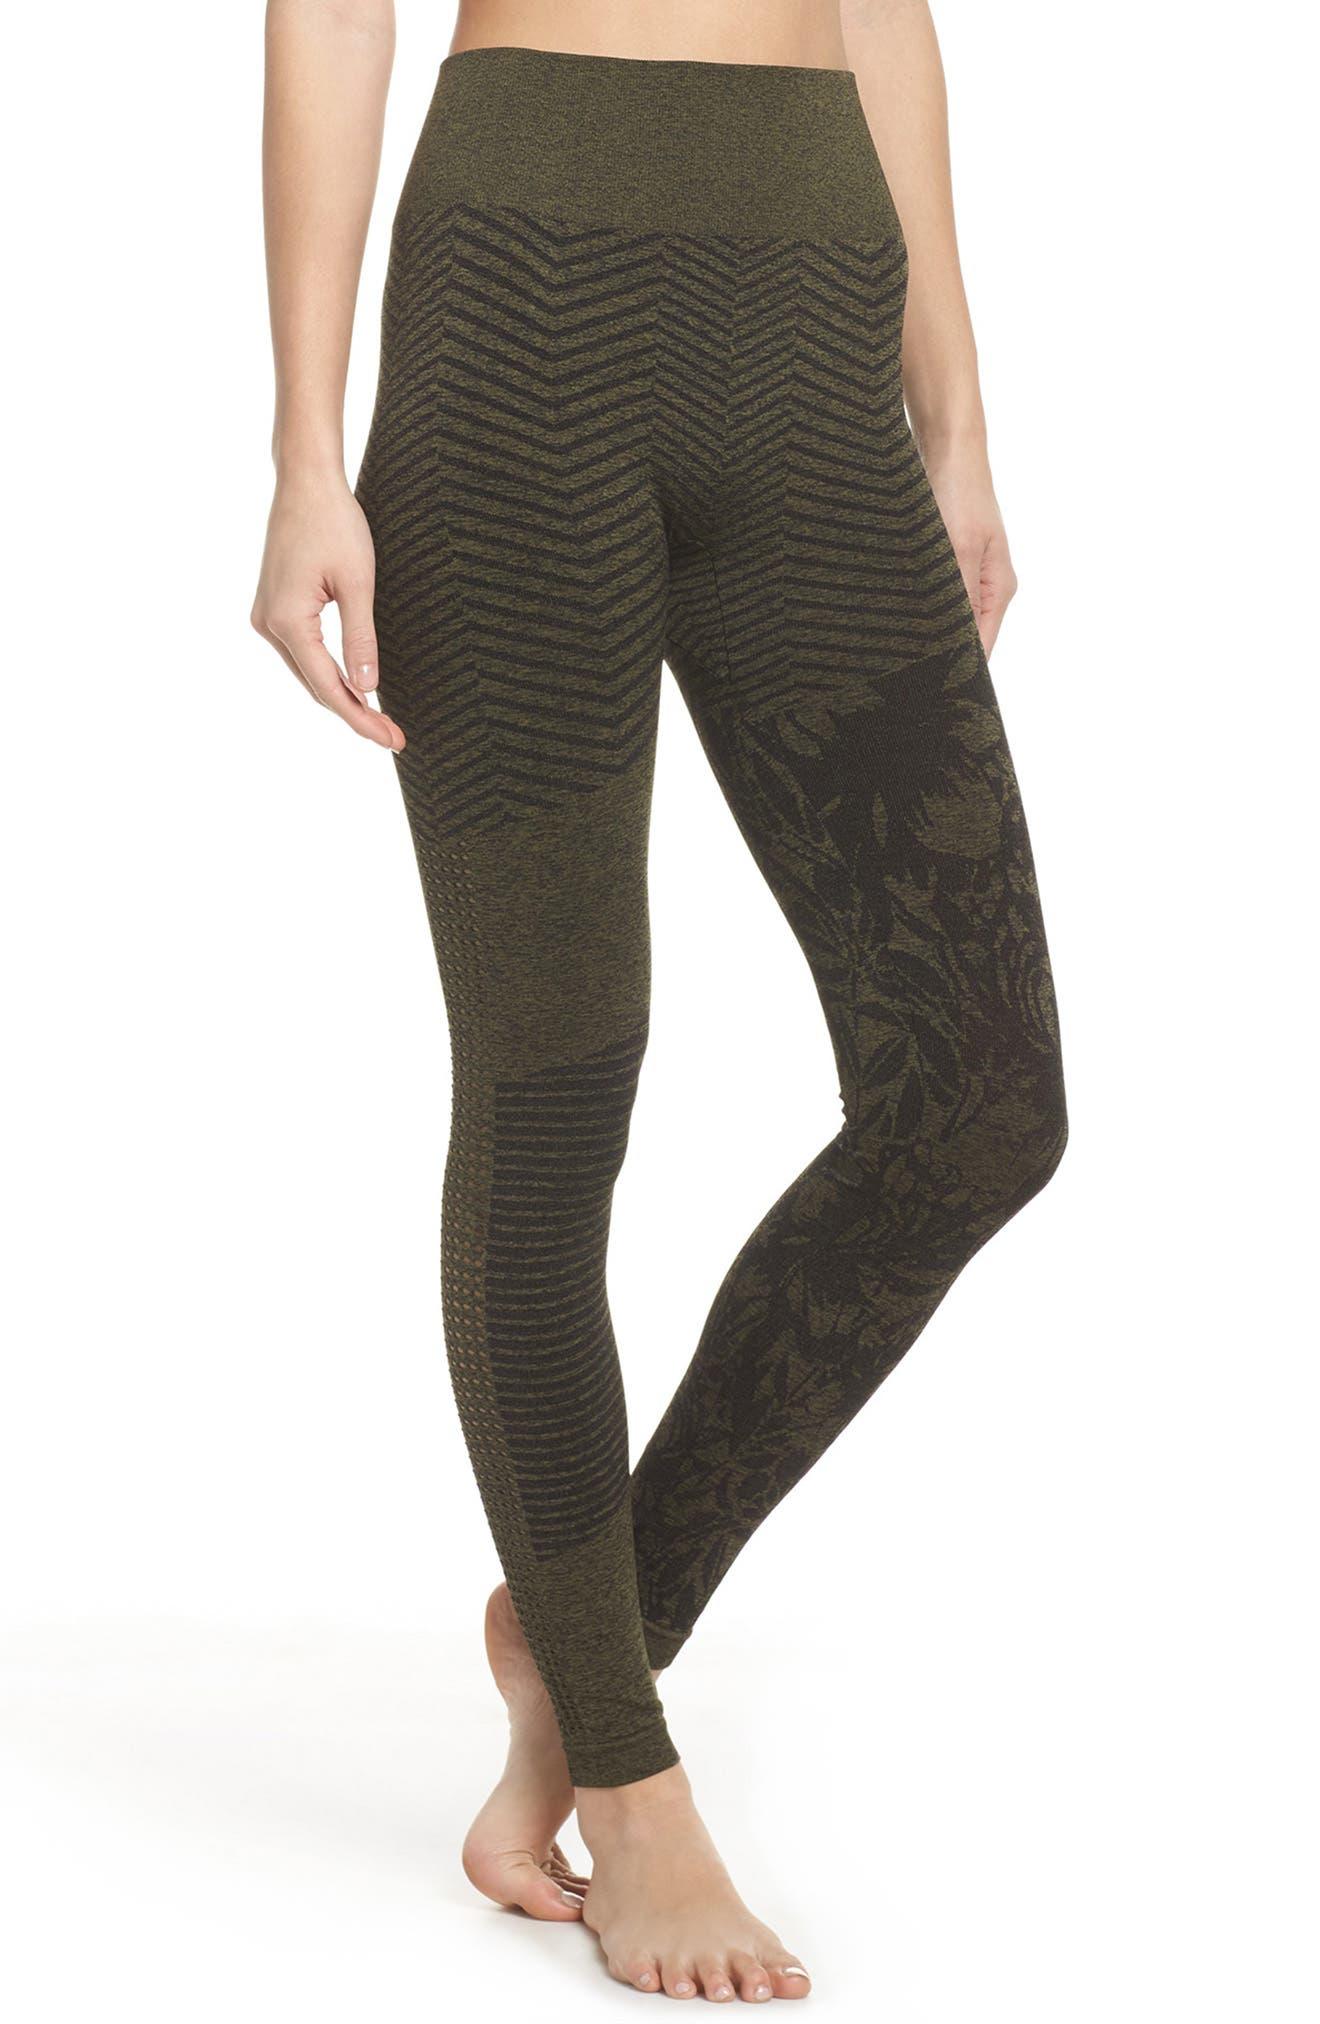 Cadence High Waist Leggings,                         Main,                         color, Deep Lichen Green/ Black